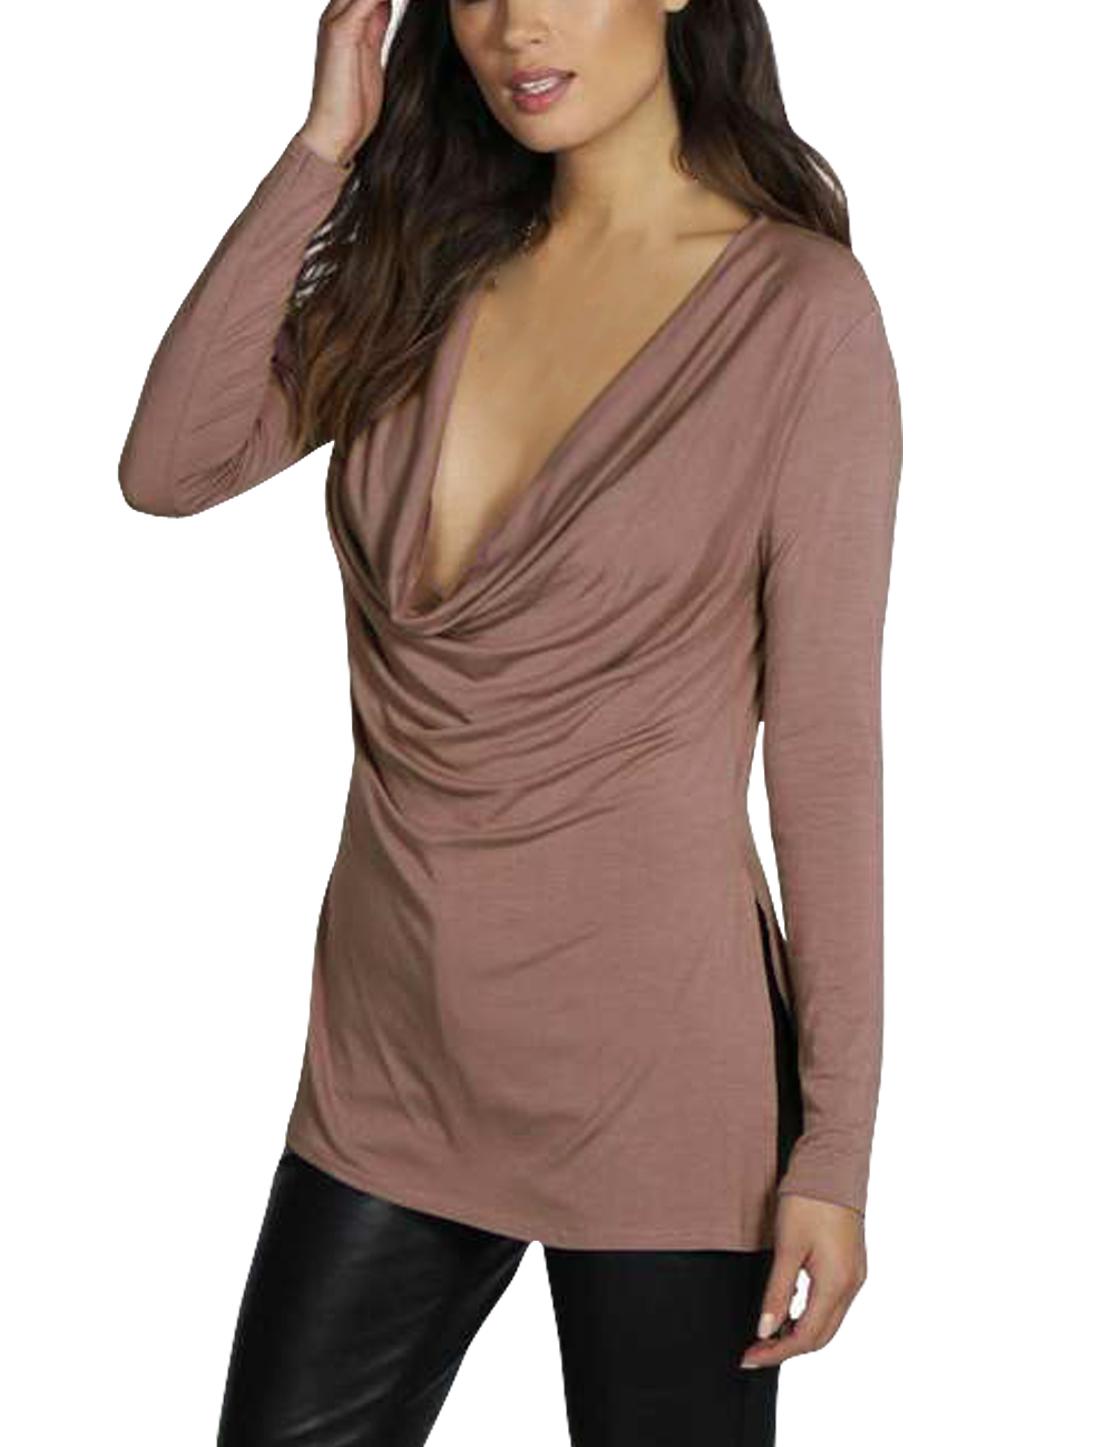 Ladies Cowl Neck Split Sides Design Tunic Long Sleeves Top Pink M